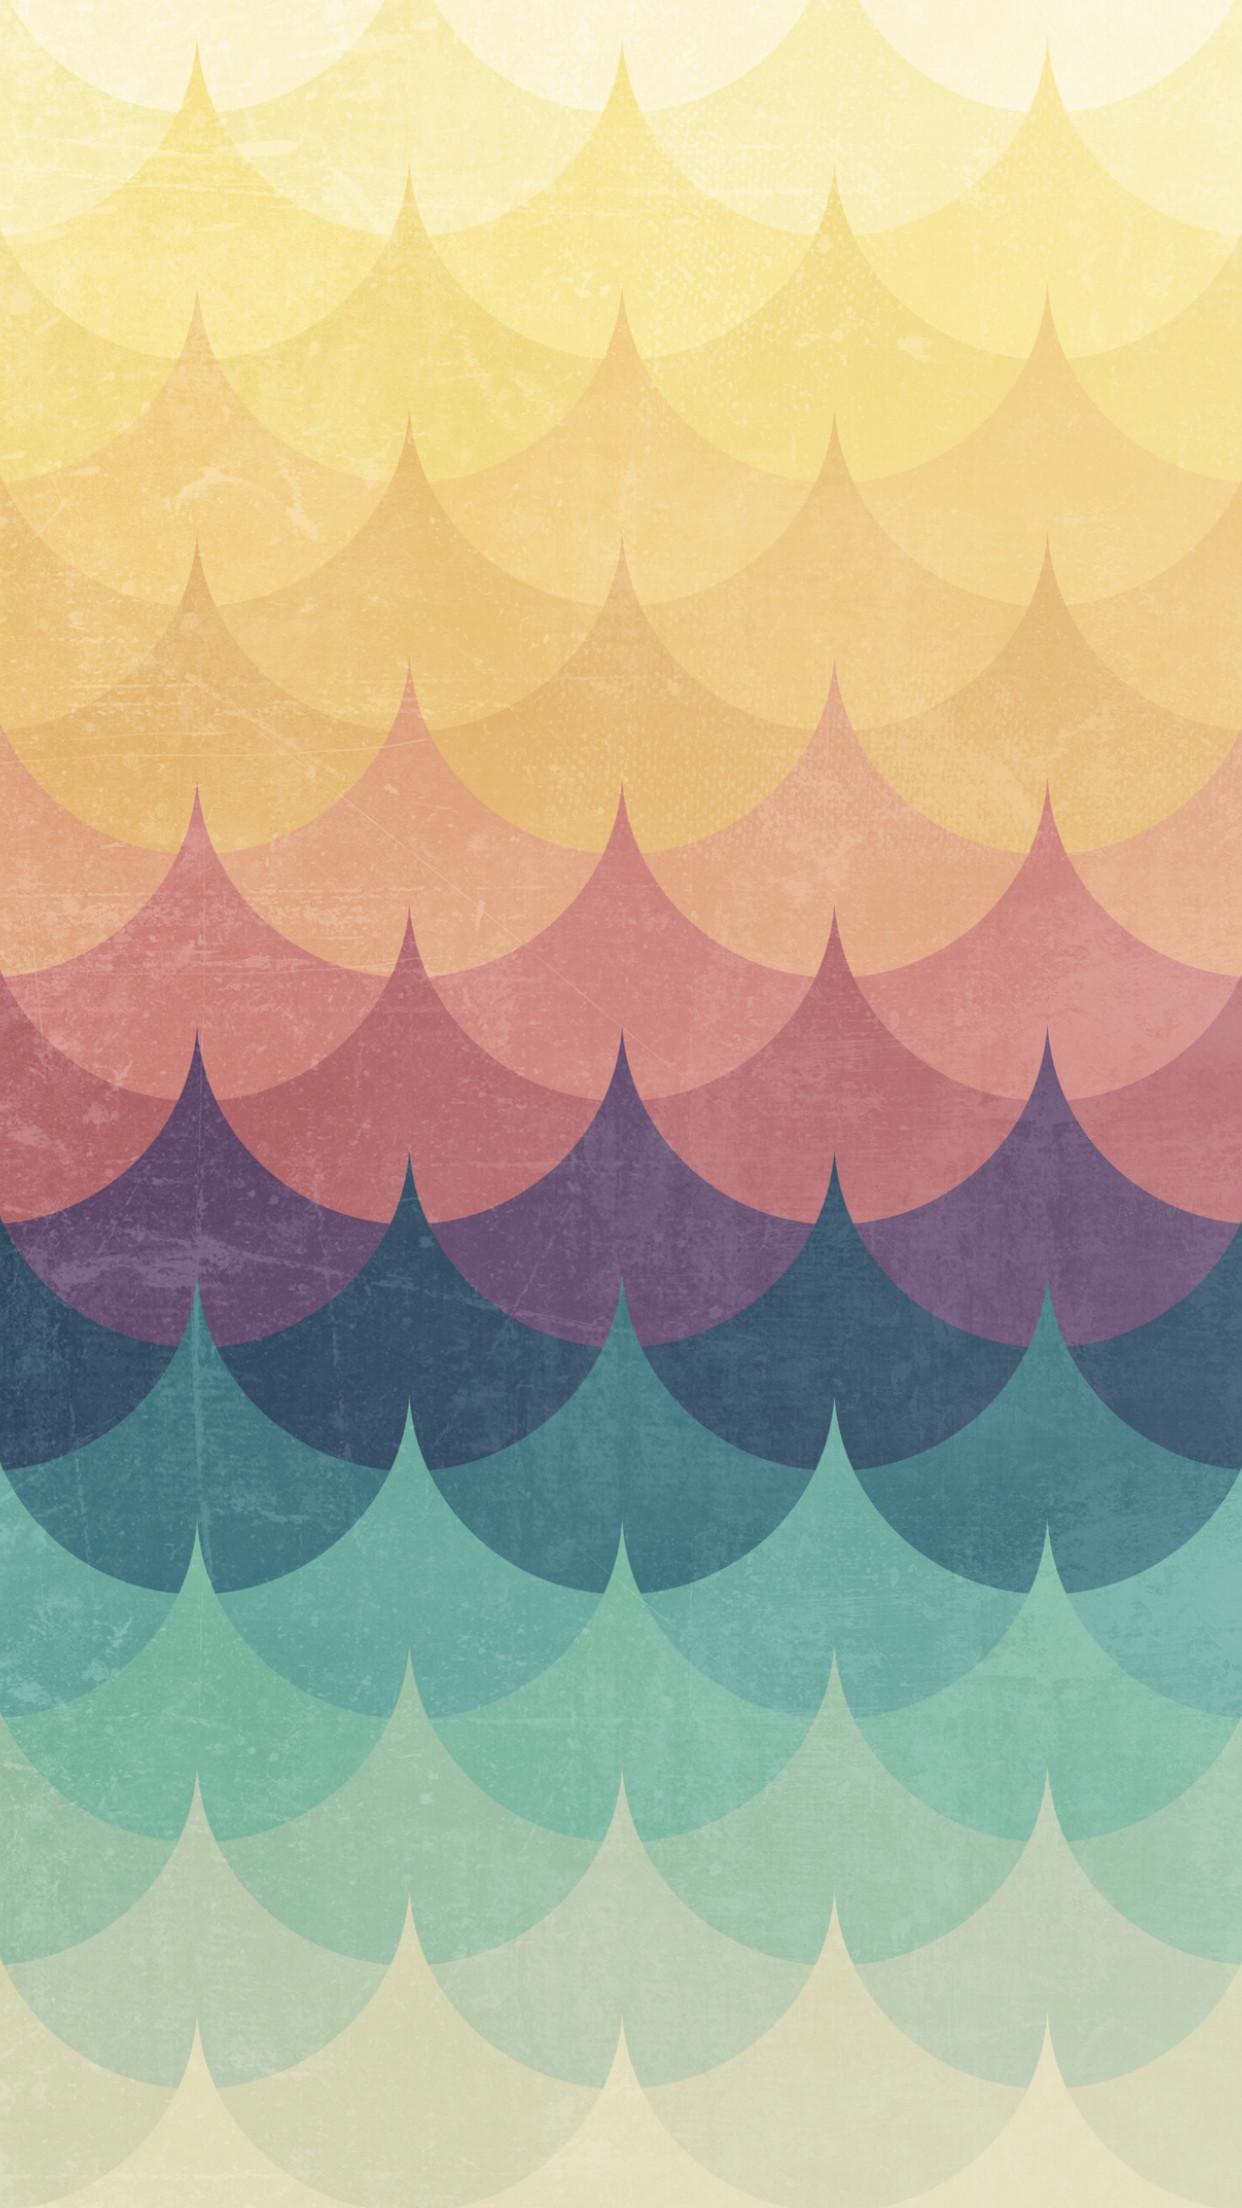 Simple Minimal Points Wallpaper iPhone 6 Plus